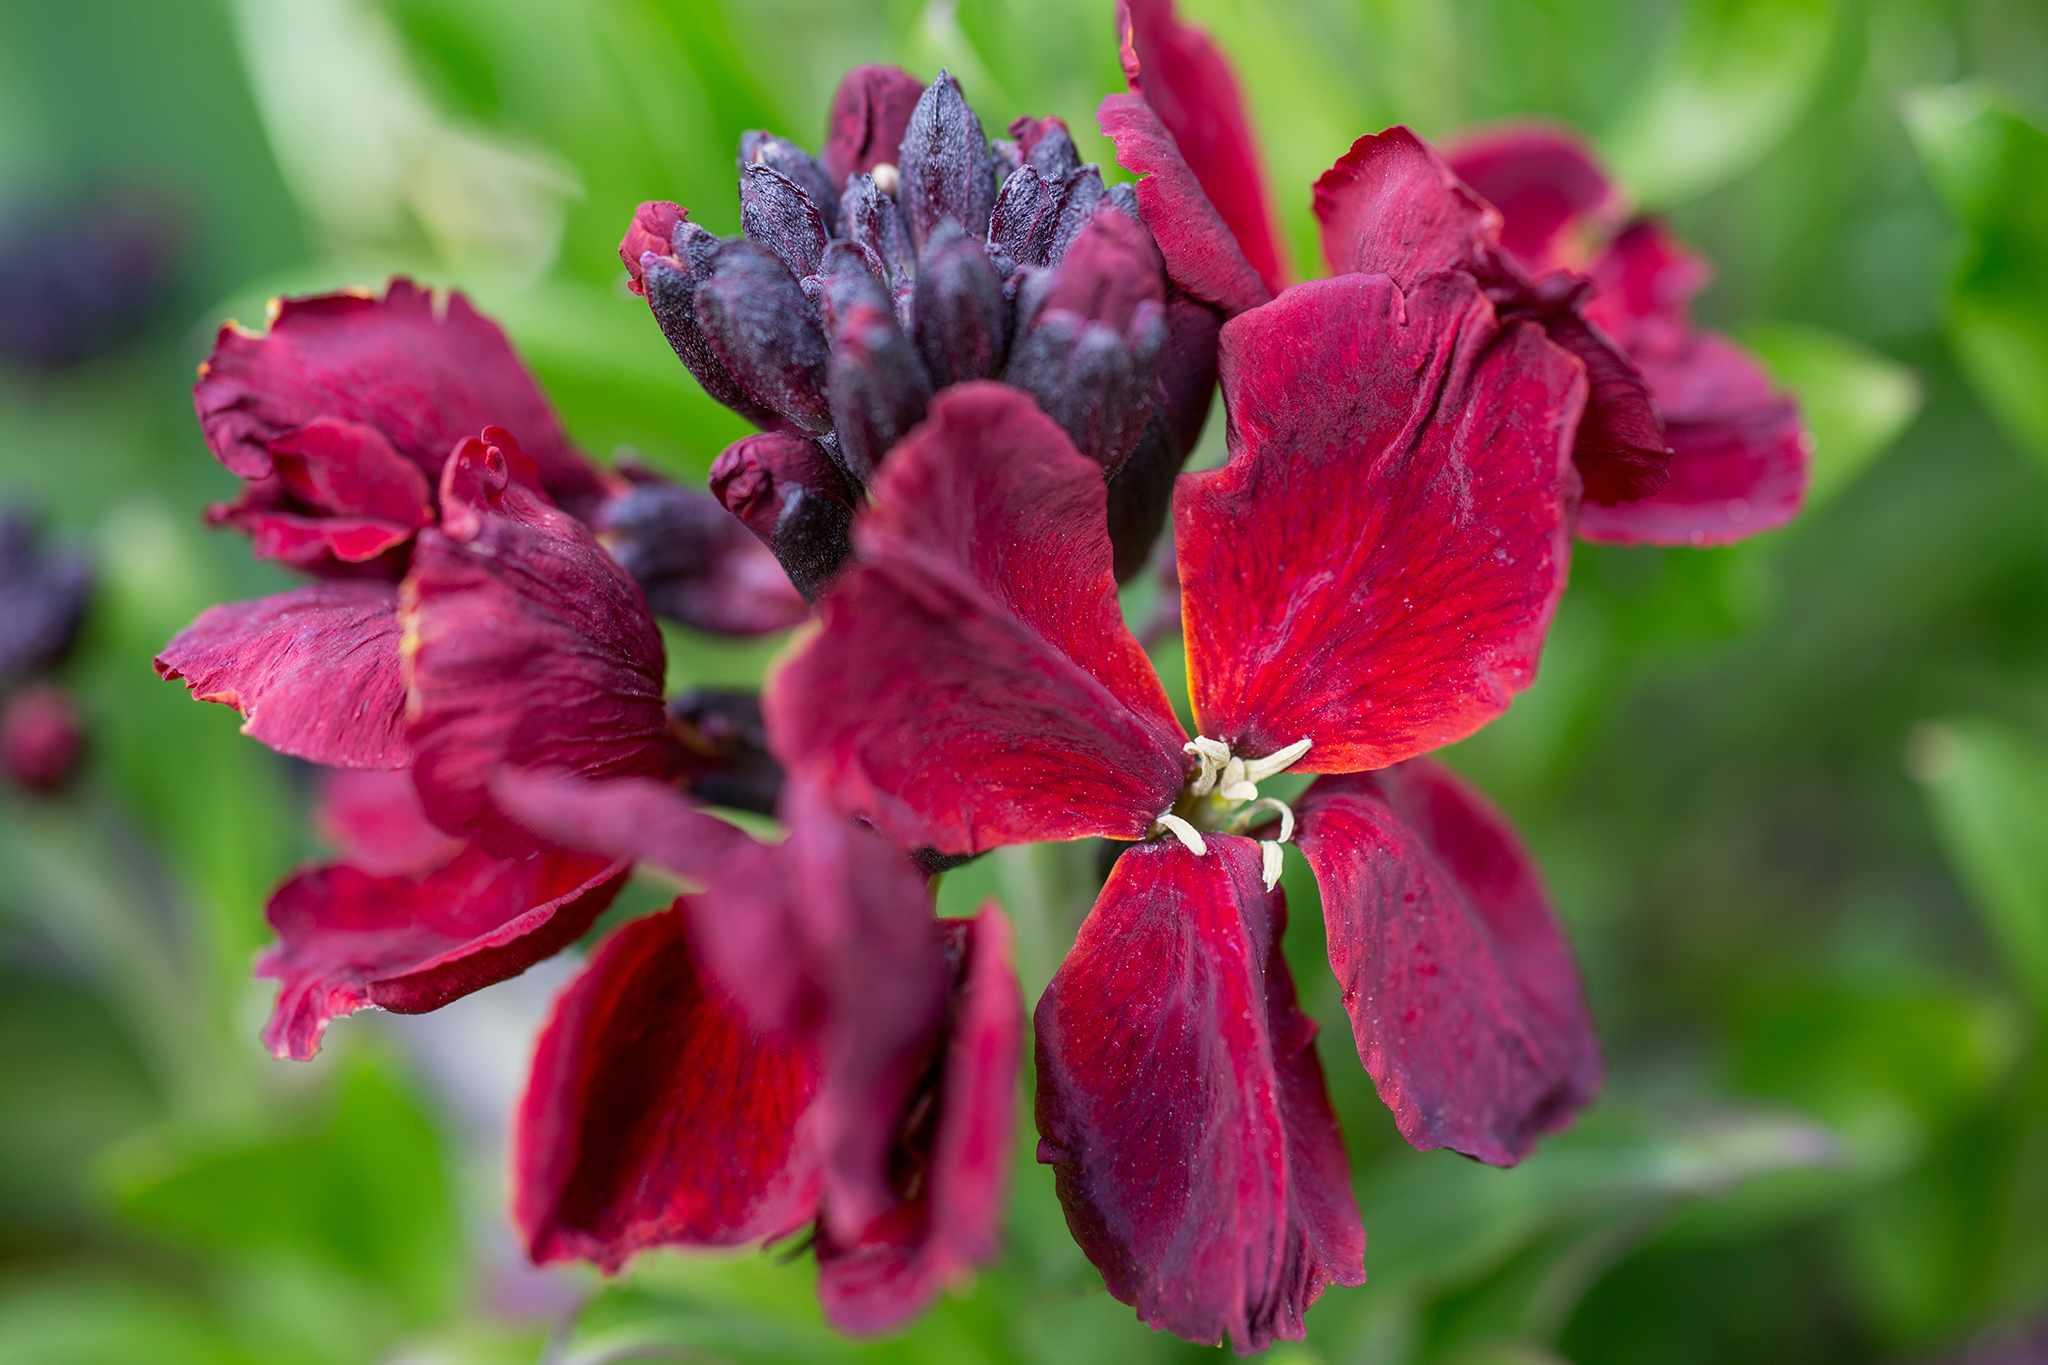 crocus-20-per-cent-wallflower-purple-shades-2048-1365